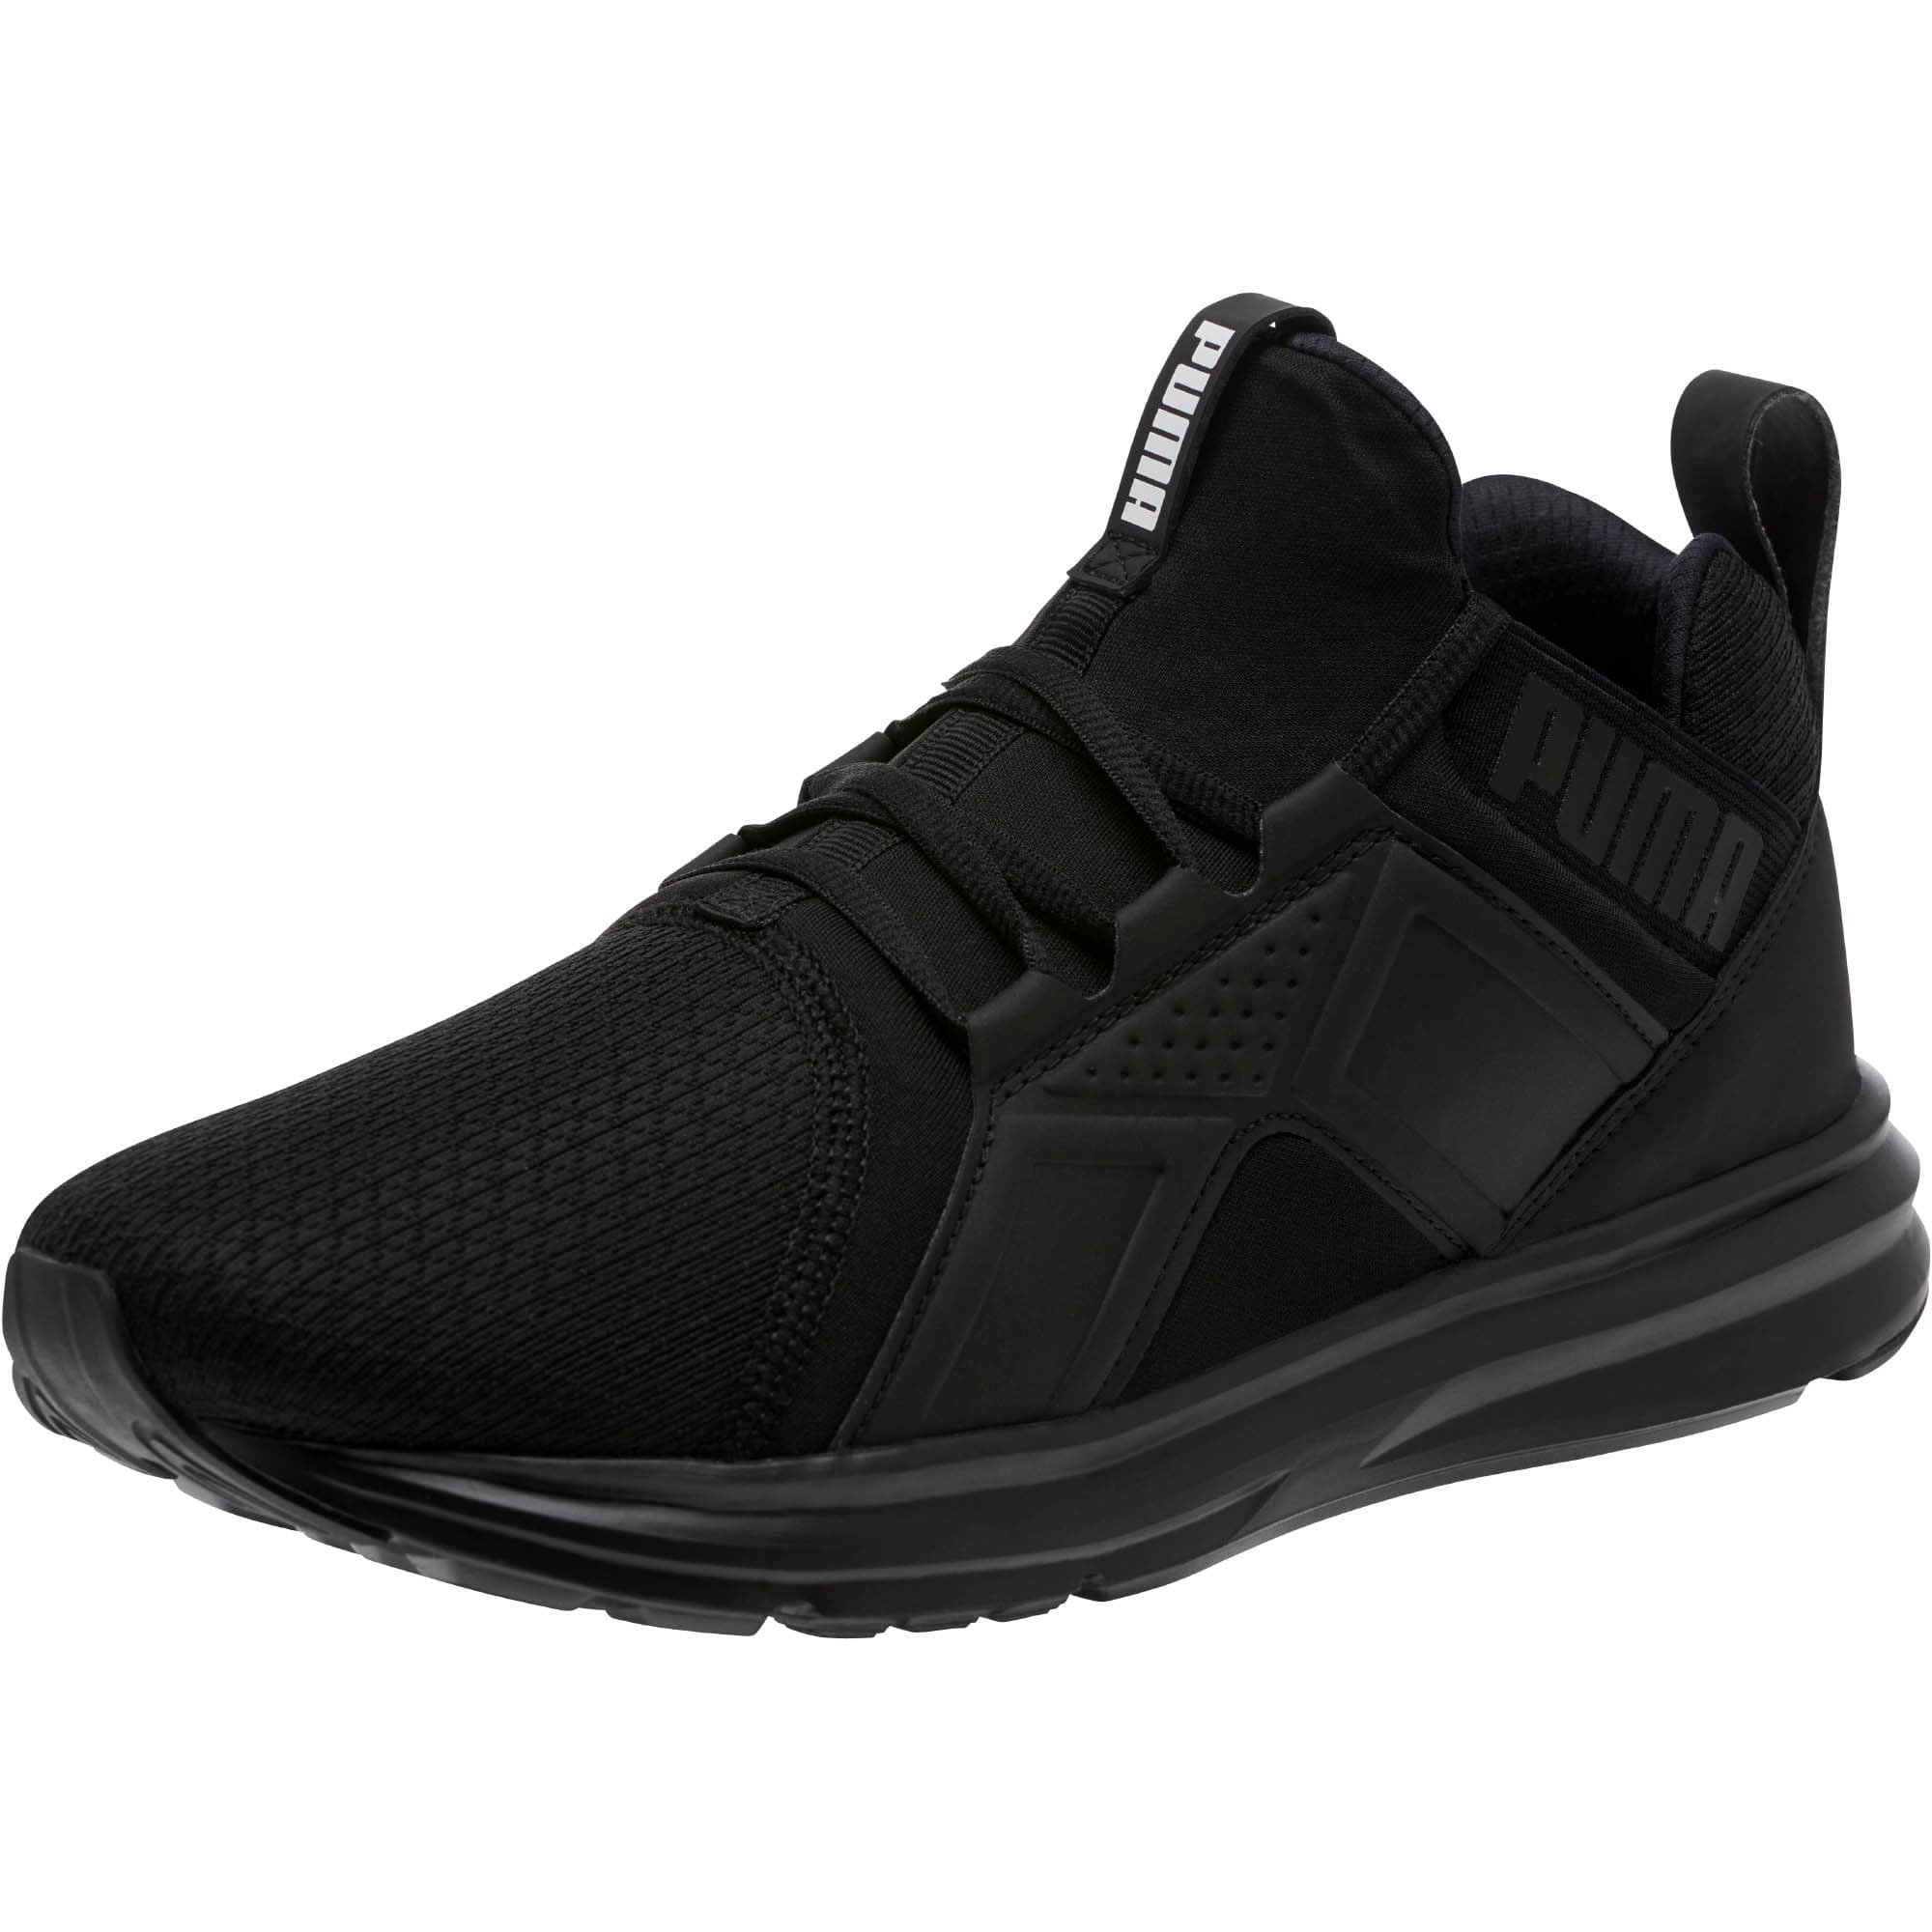 Thumbnail 1 of Enzo Wide Men's Training Shoes, Puma Black, medium